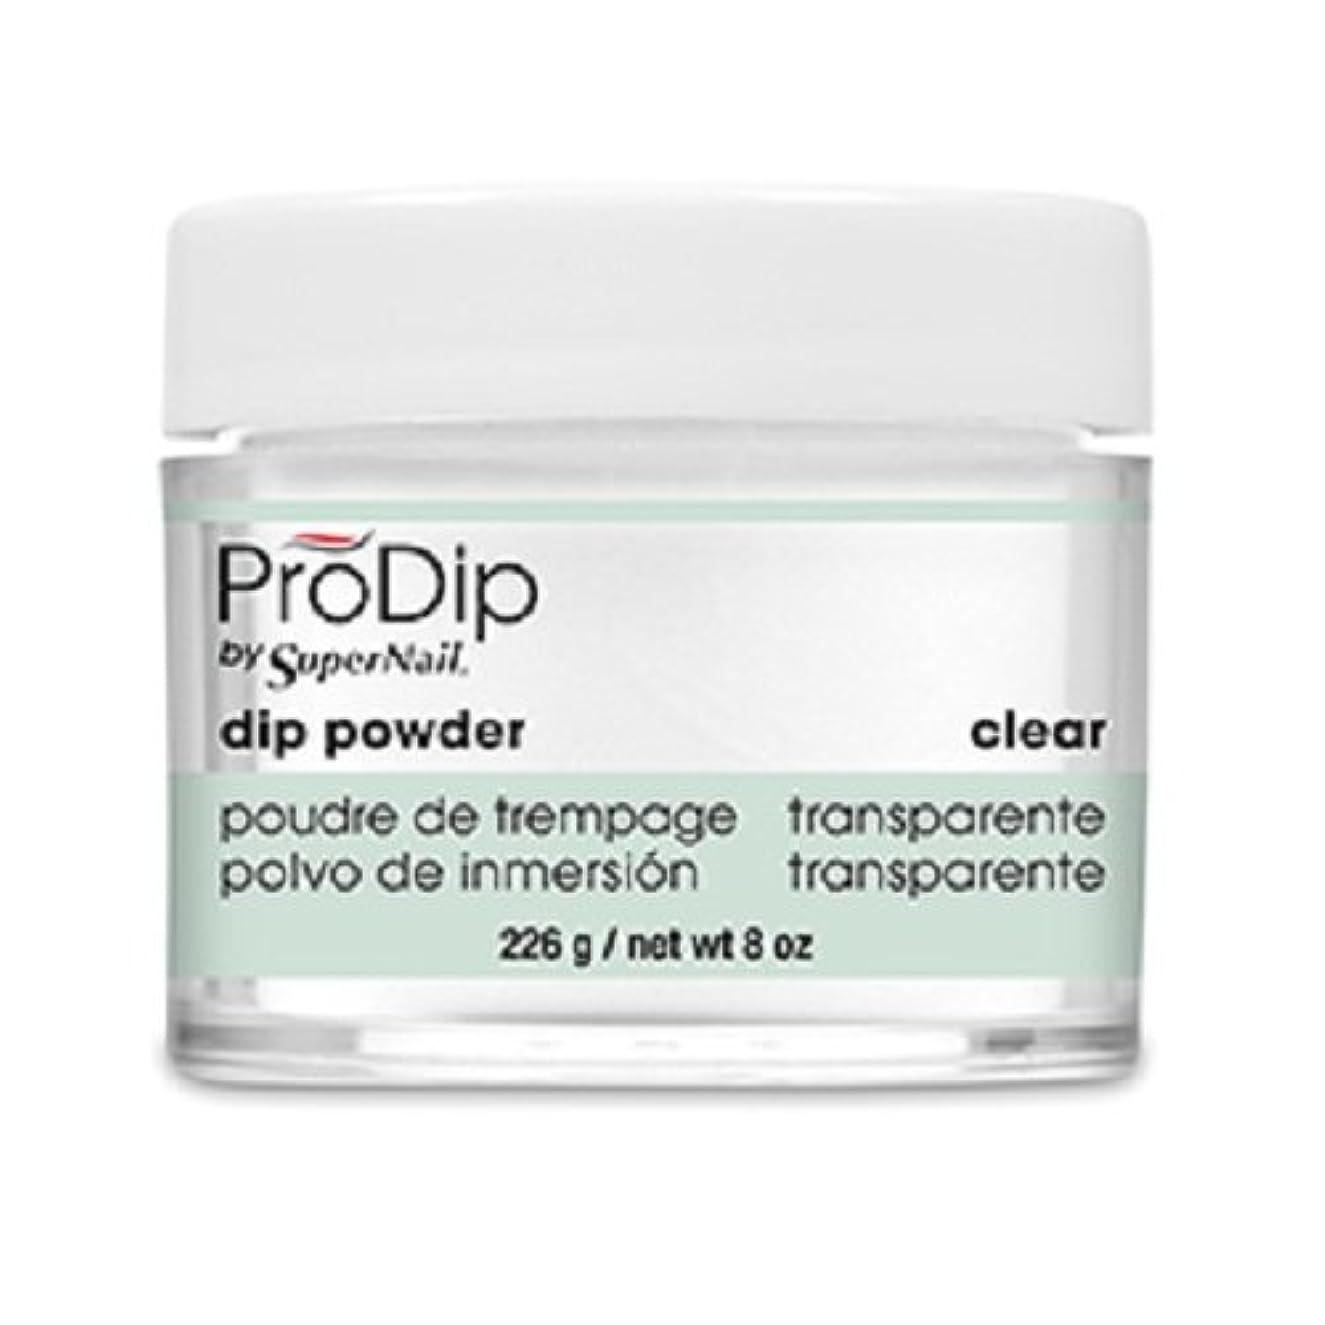 召喚する距離拒絶SuperNail - ProDip - Dip Powder - Clear - 226 g/8 oz